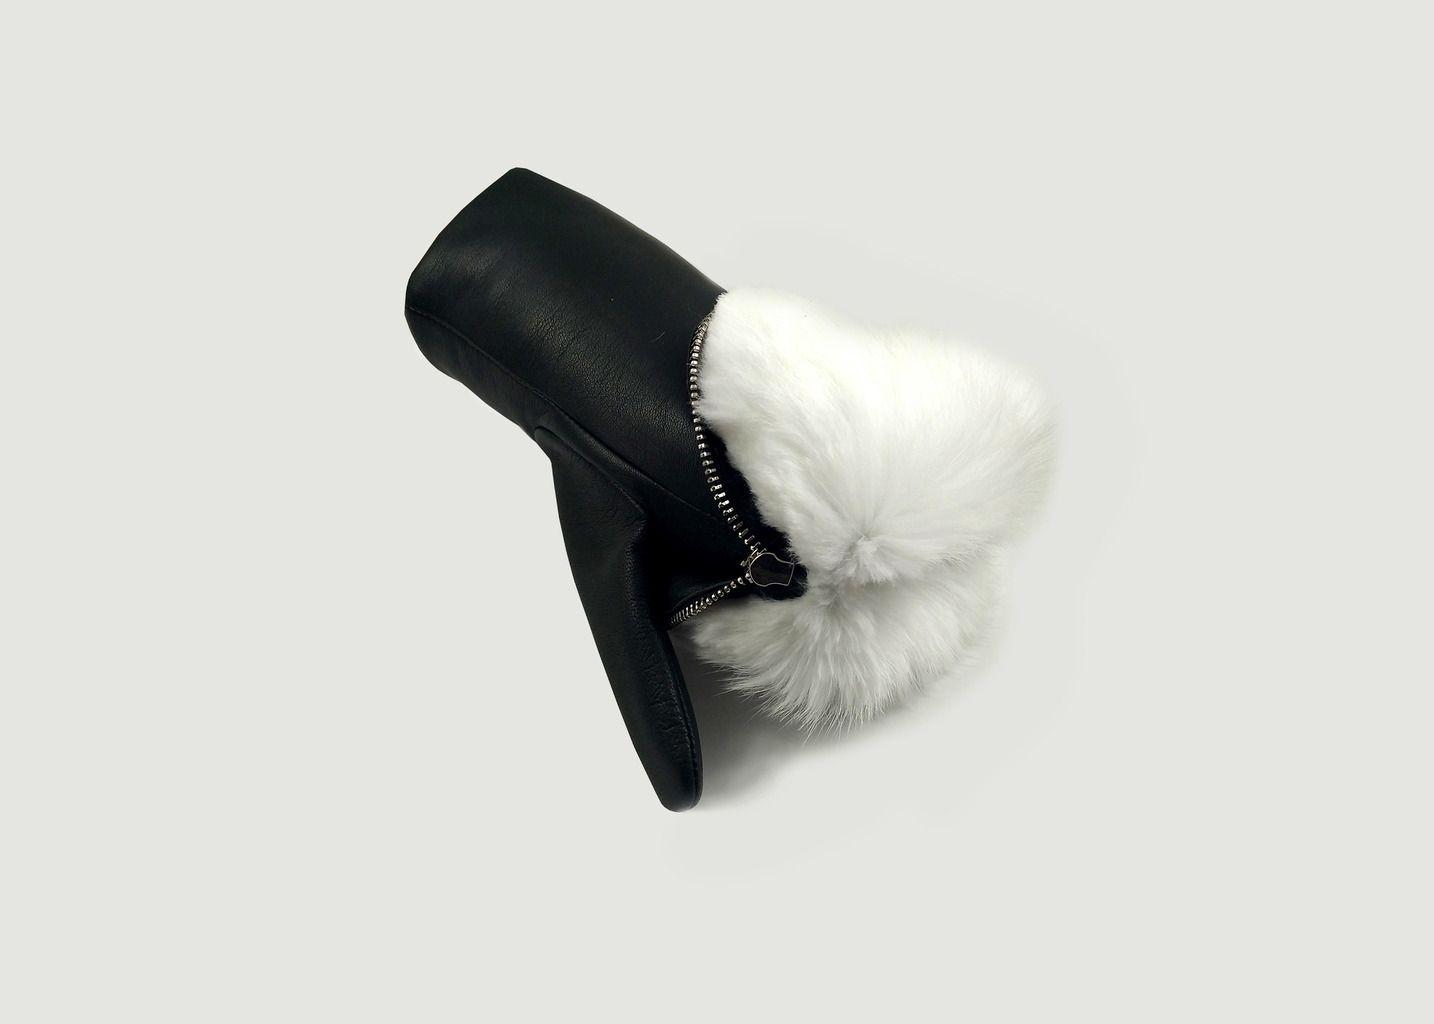 Moufles A136 - Aristide